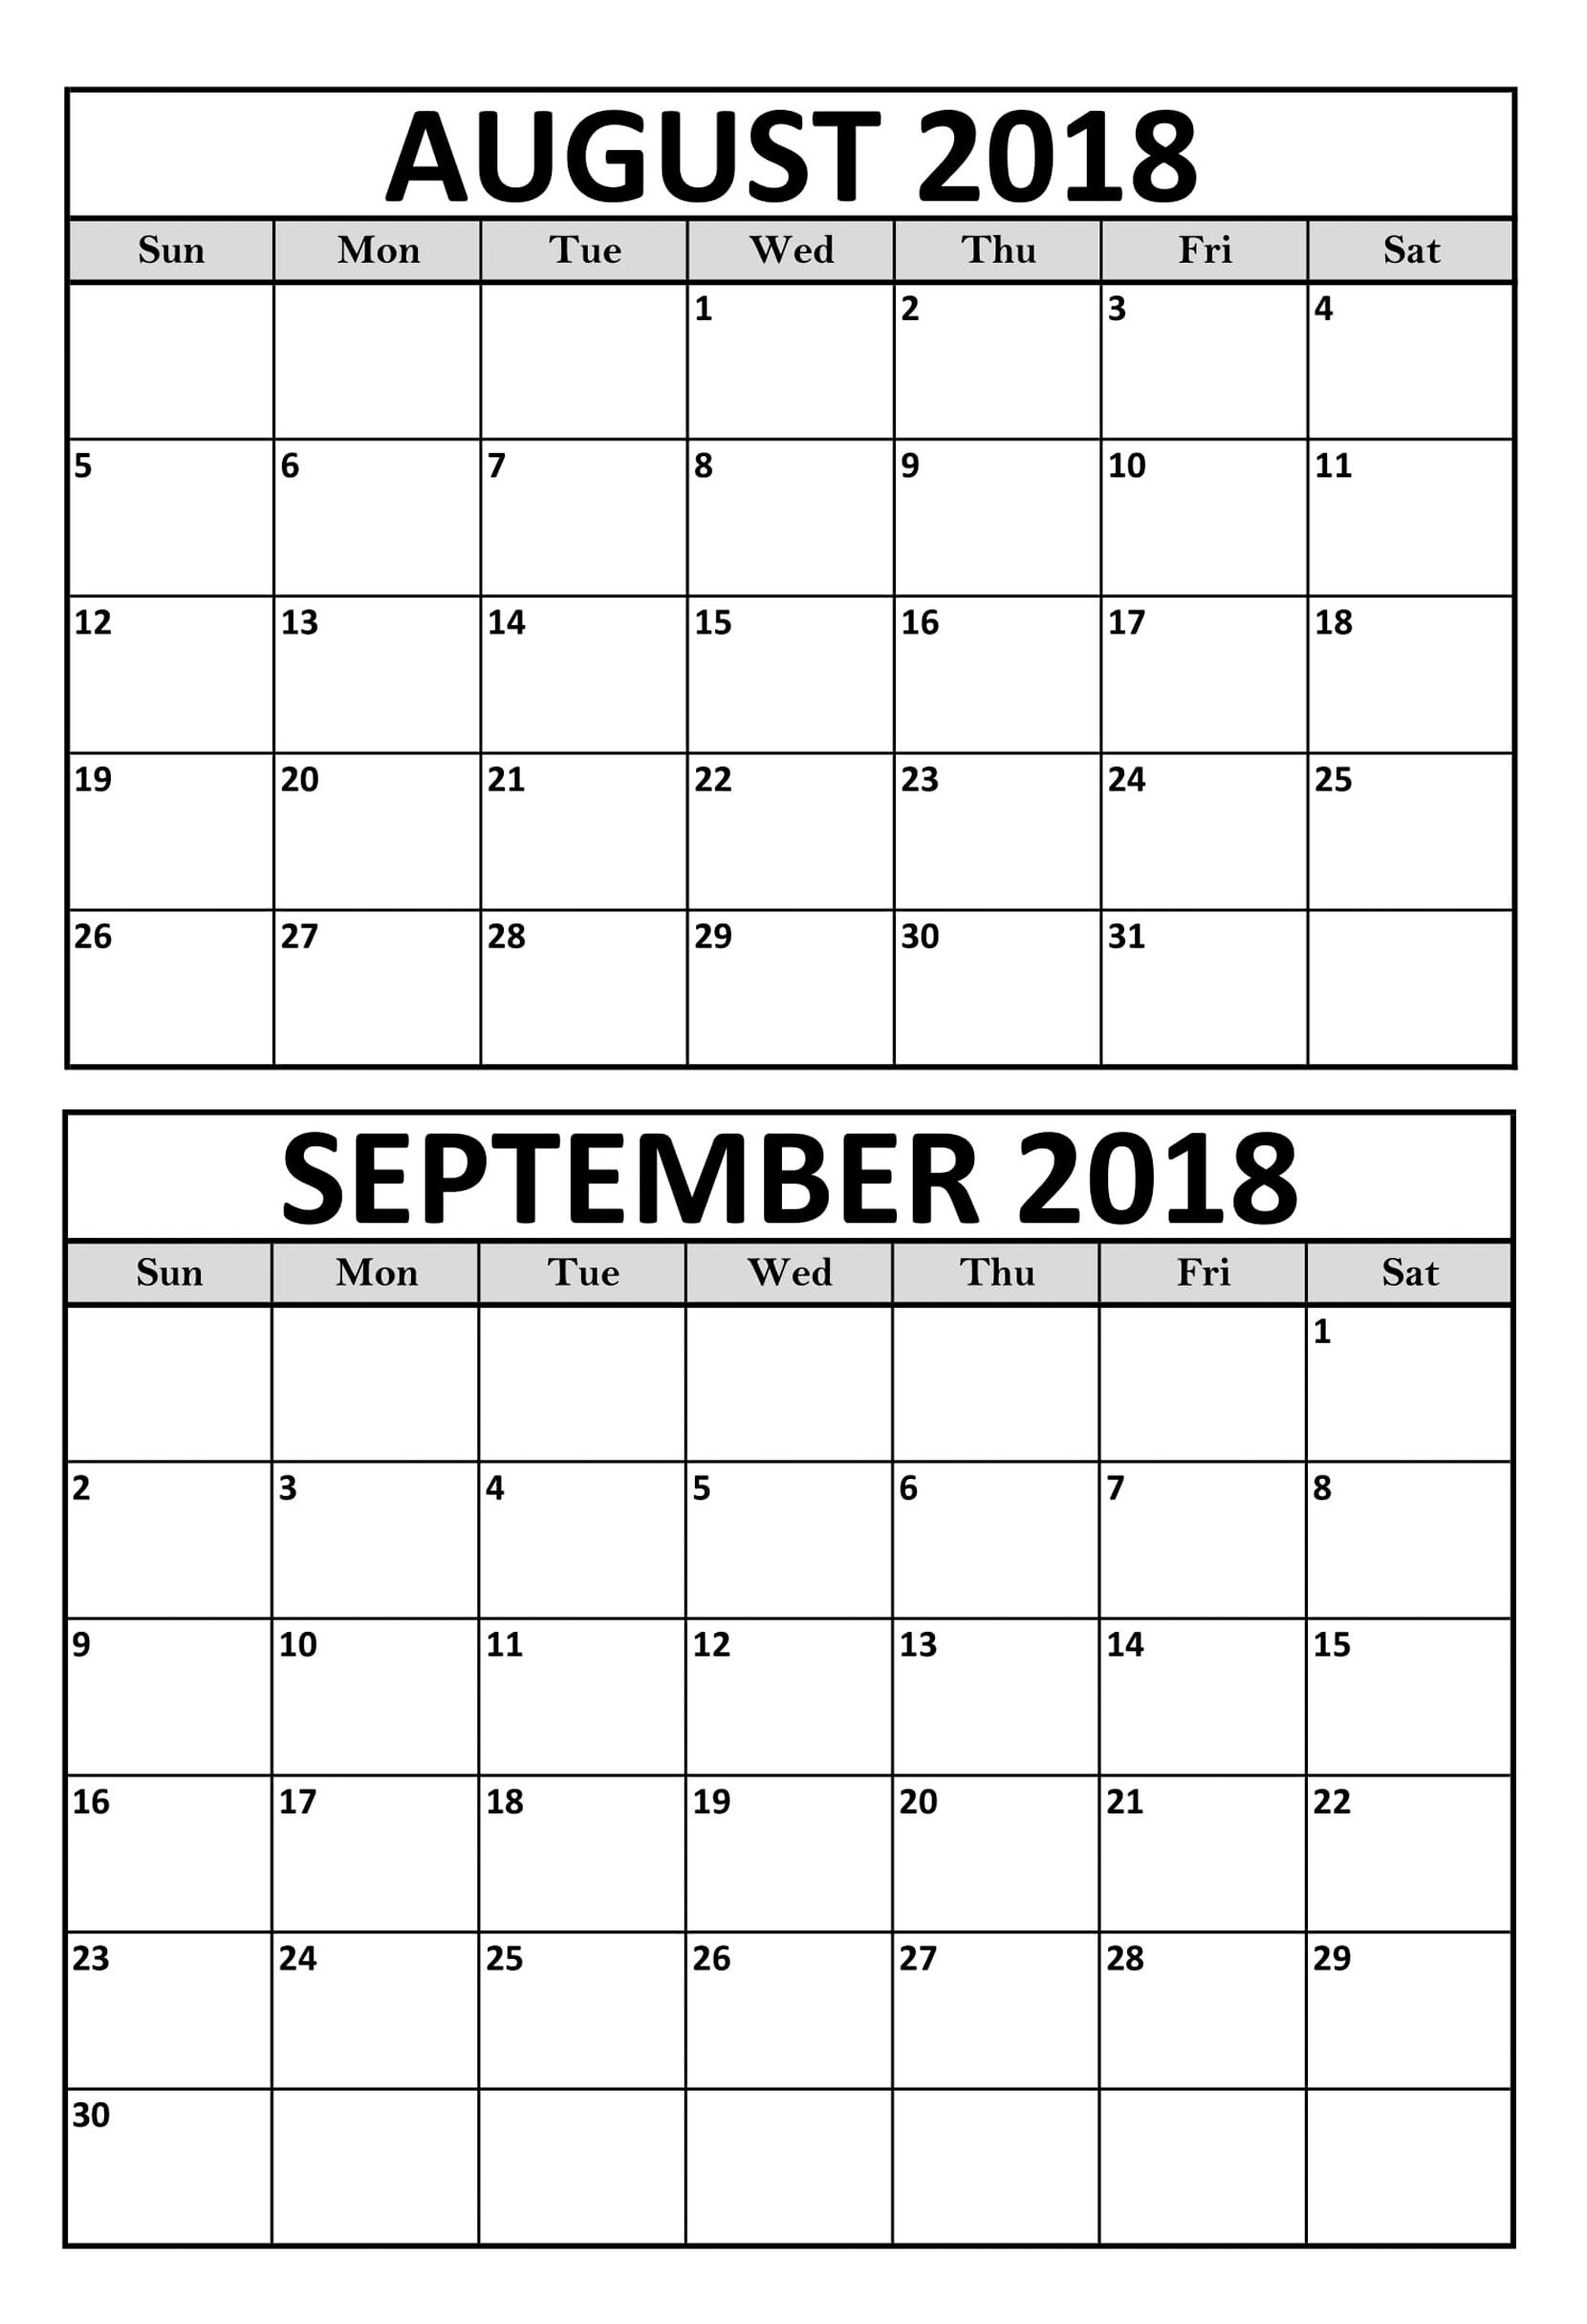 August September Calendar Printable Template